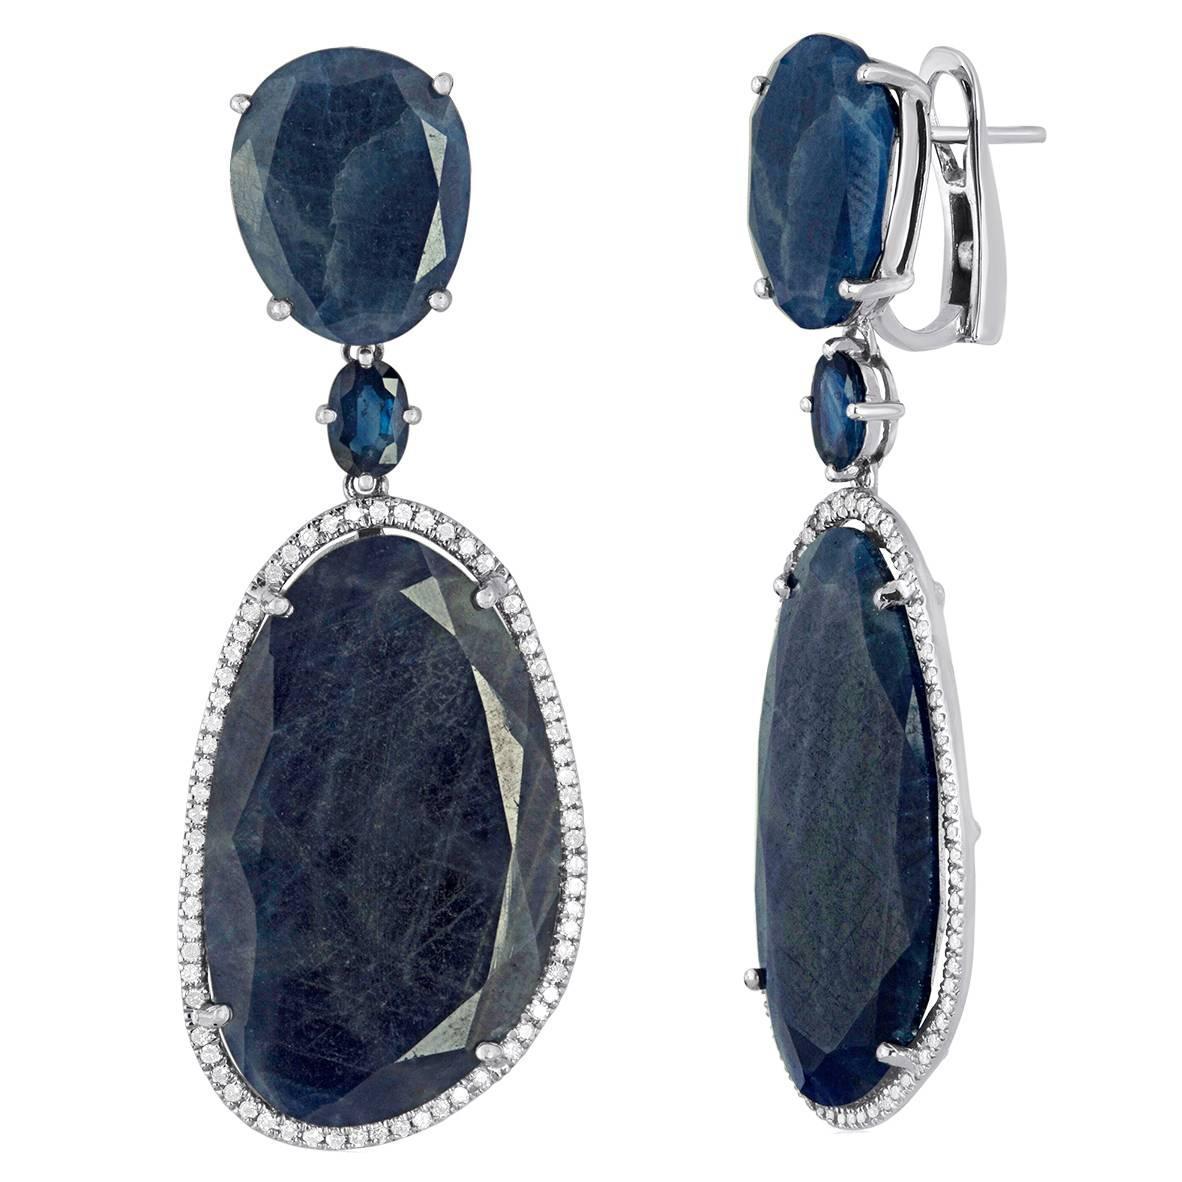 82.61 Carats Sliced Sapphire Diamond White Gold Drop Earrings